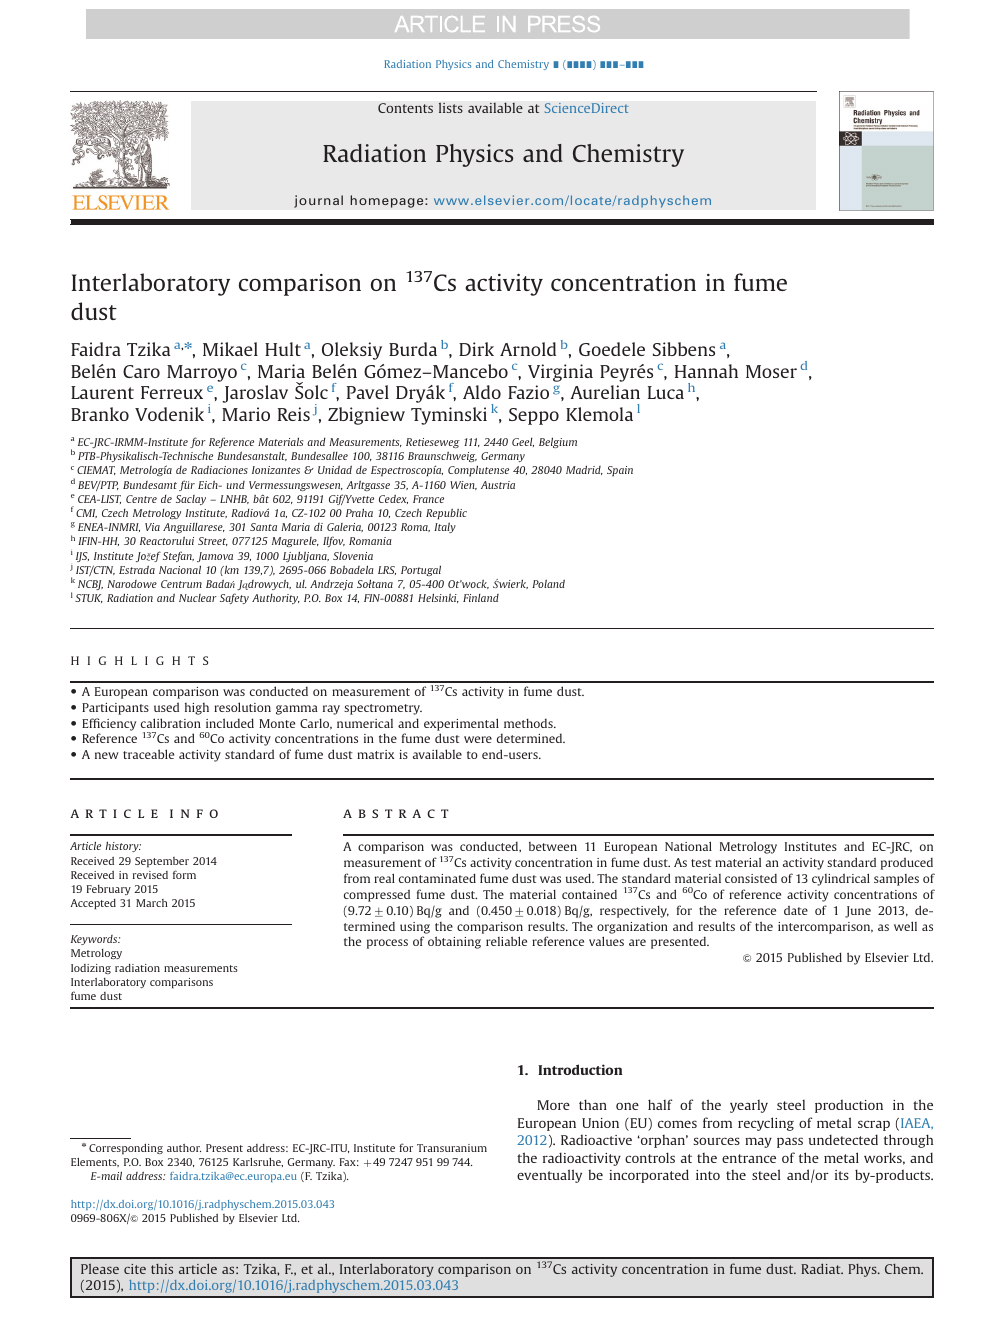 Interlaboratory comparison on 137Cs activity concentration in fume